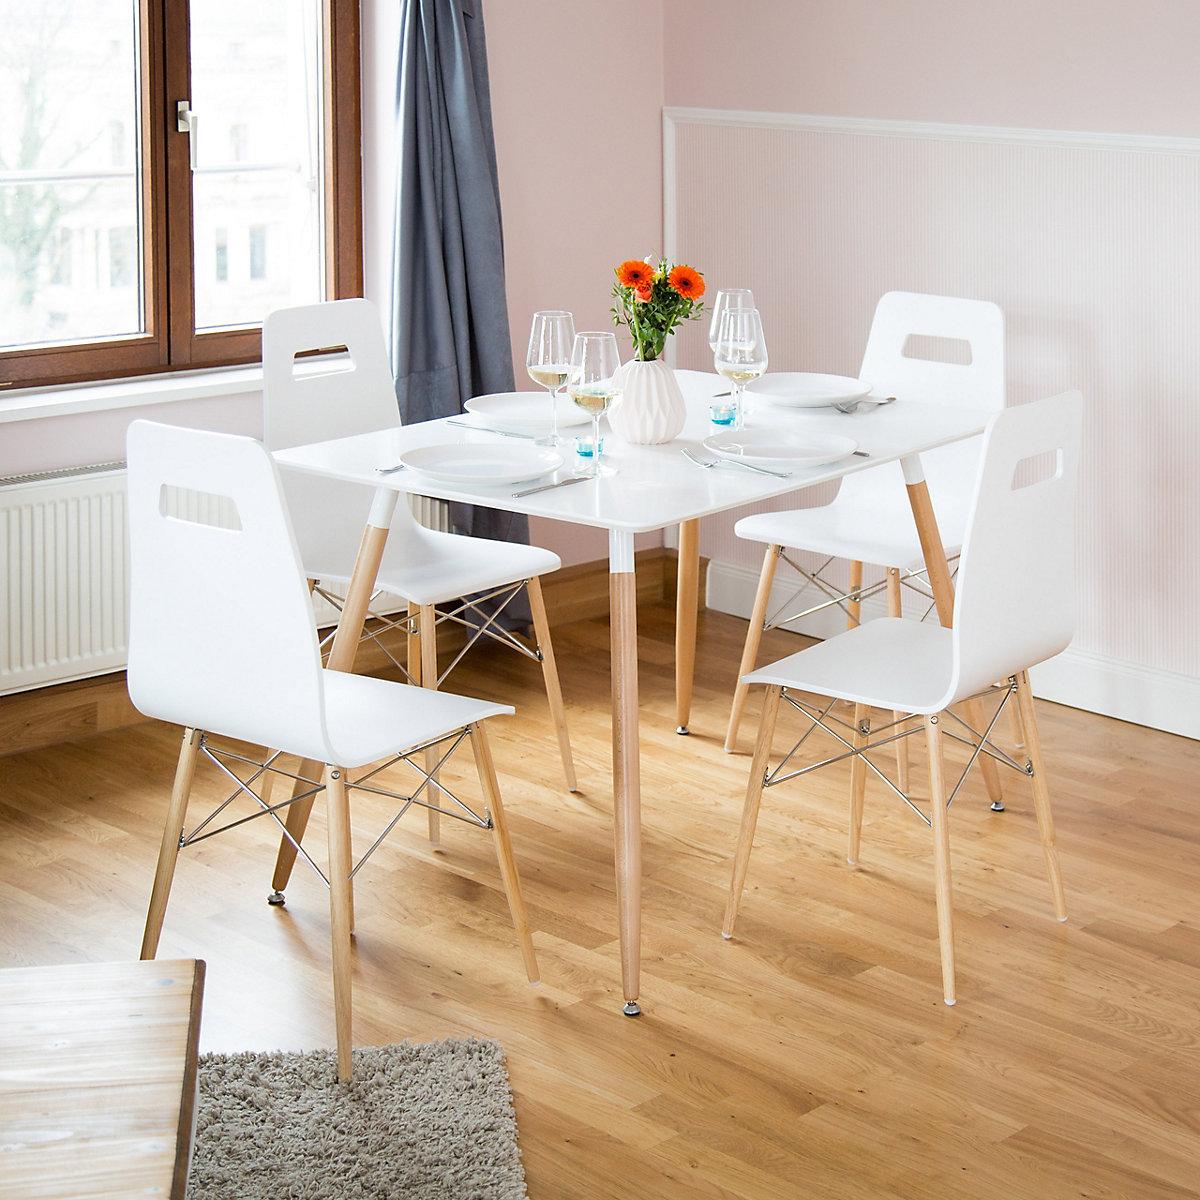 esstisch arvid 120 x 80 cm wei yomonda. Black Bedroom Furniture Sets. Home Design Ideas